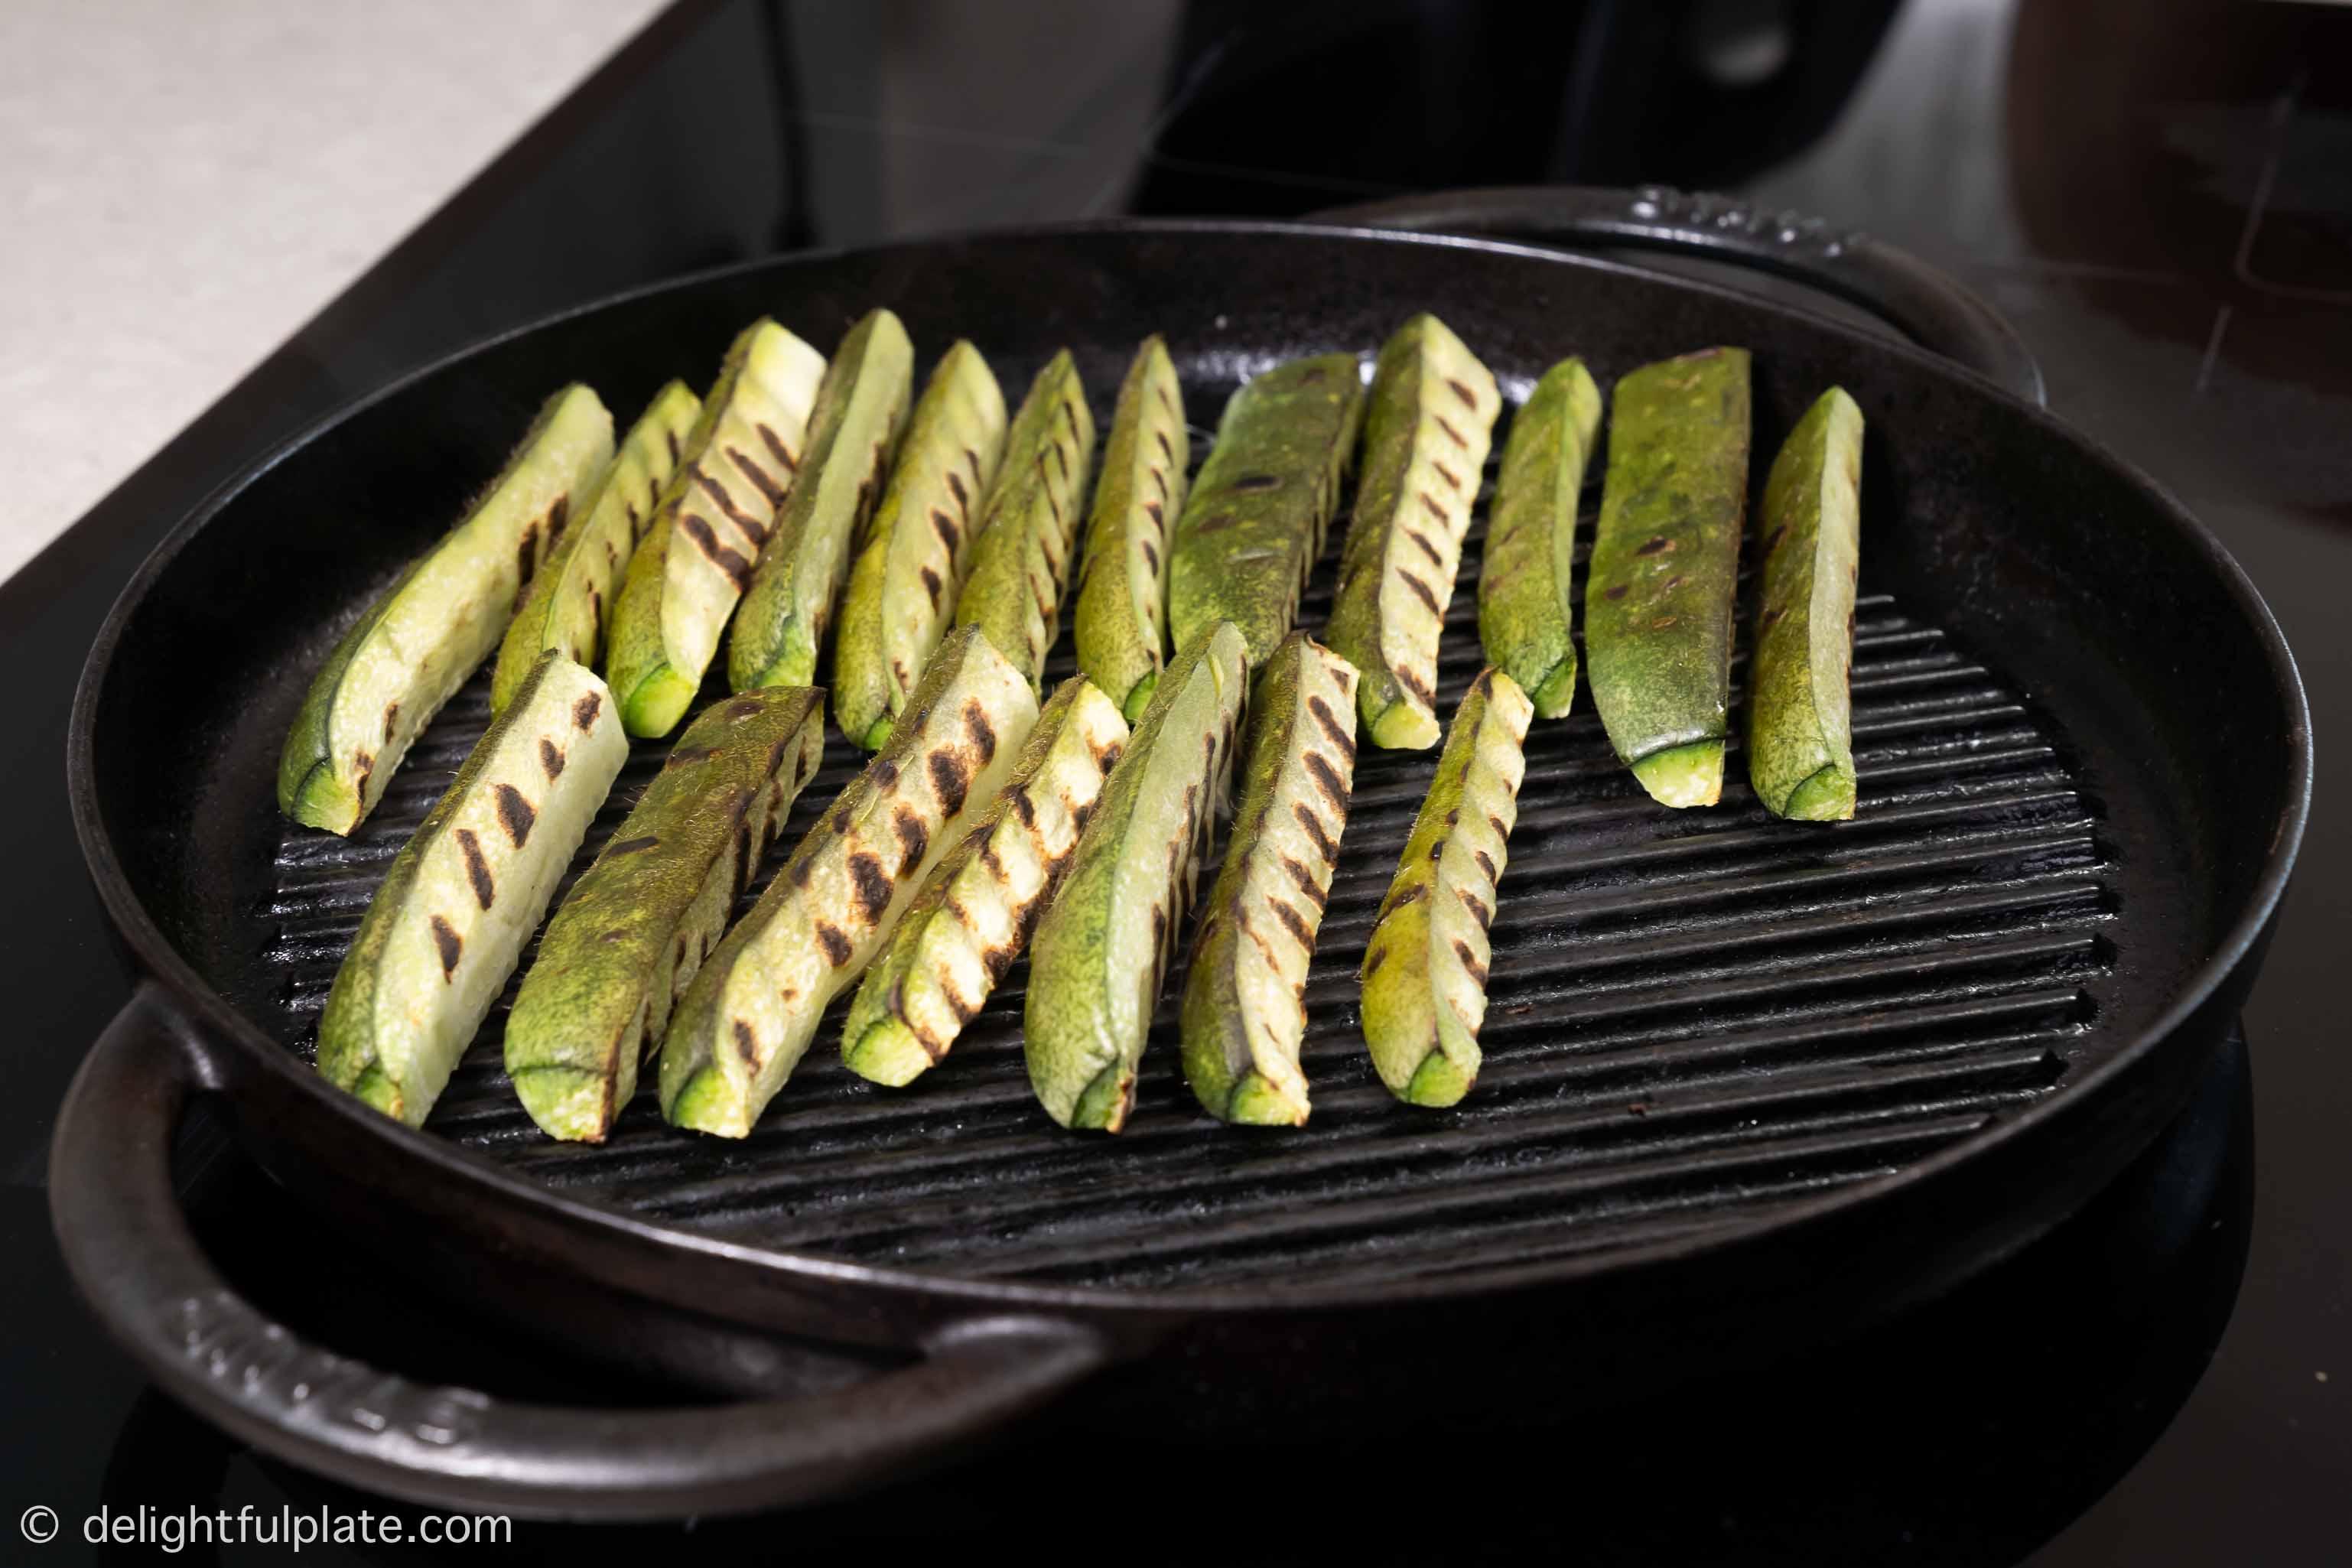 Grilling winter melon slices